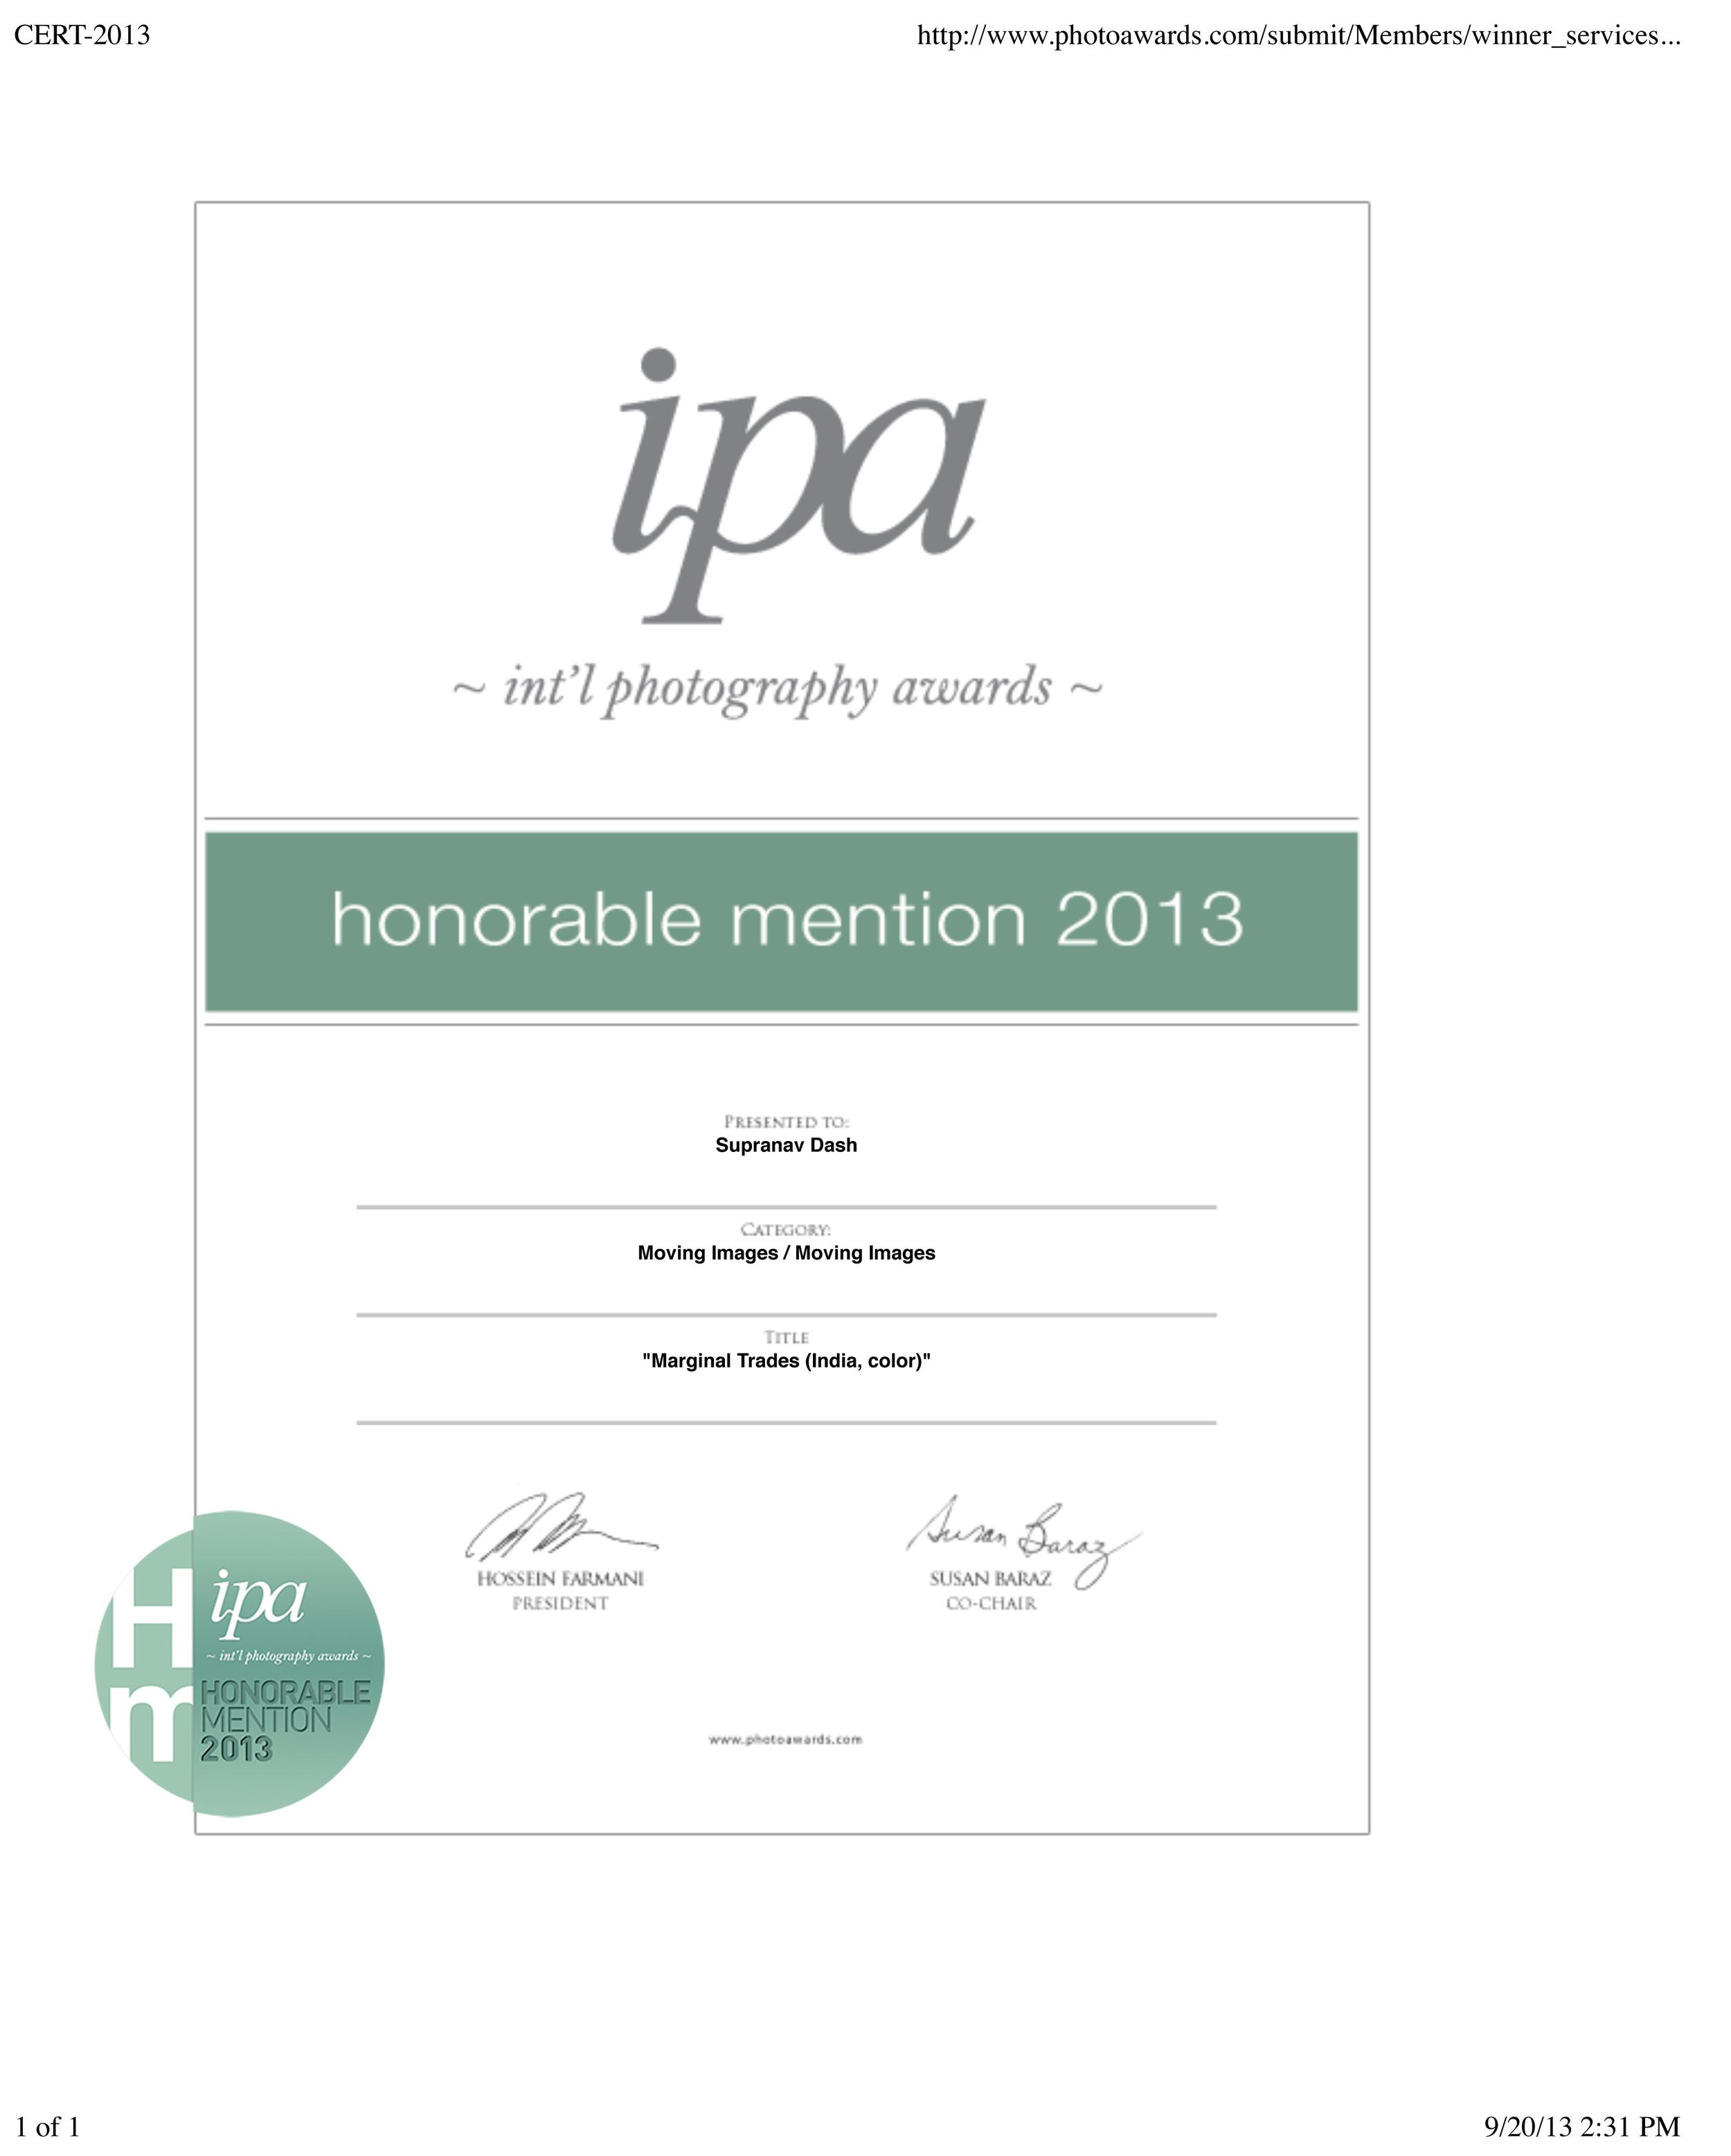 IPA_HM-CERT-2013.jpg